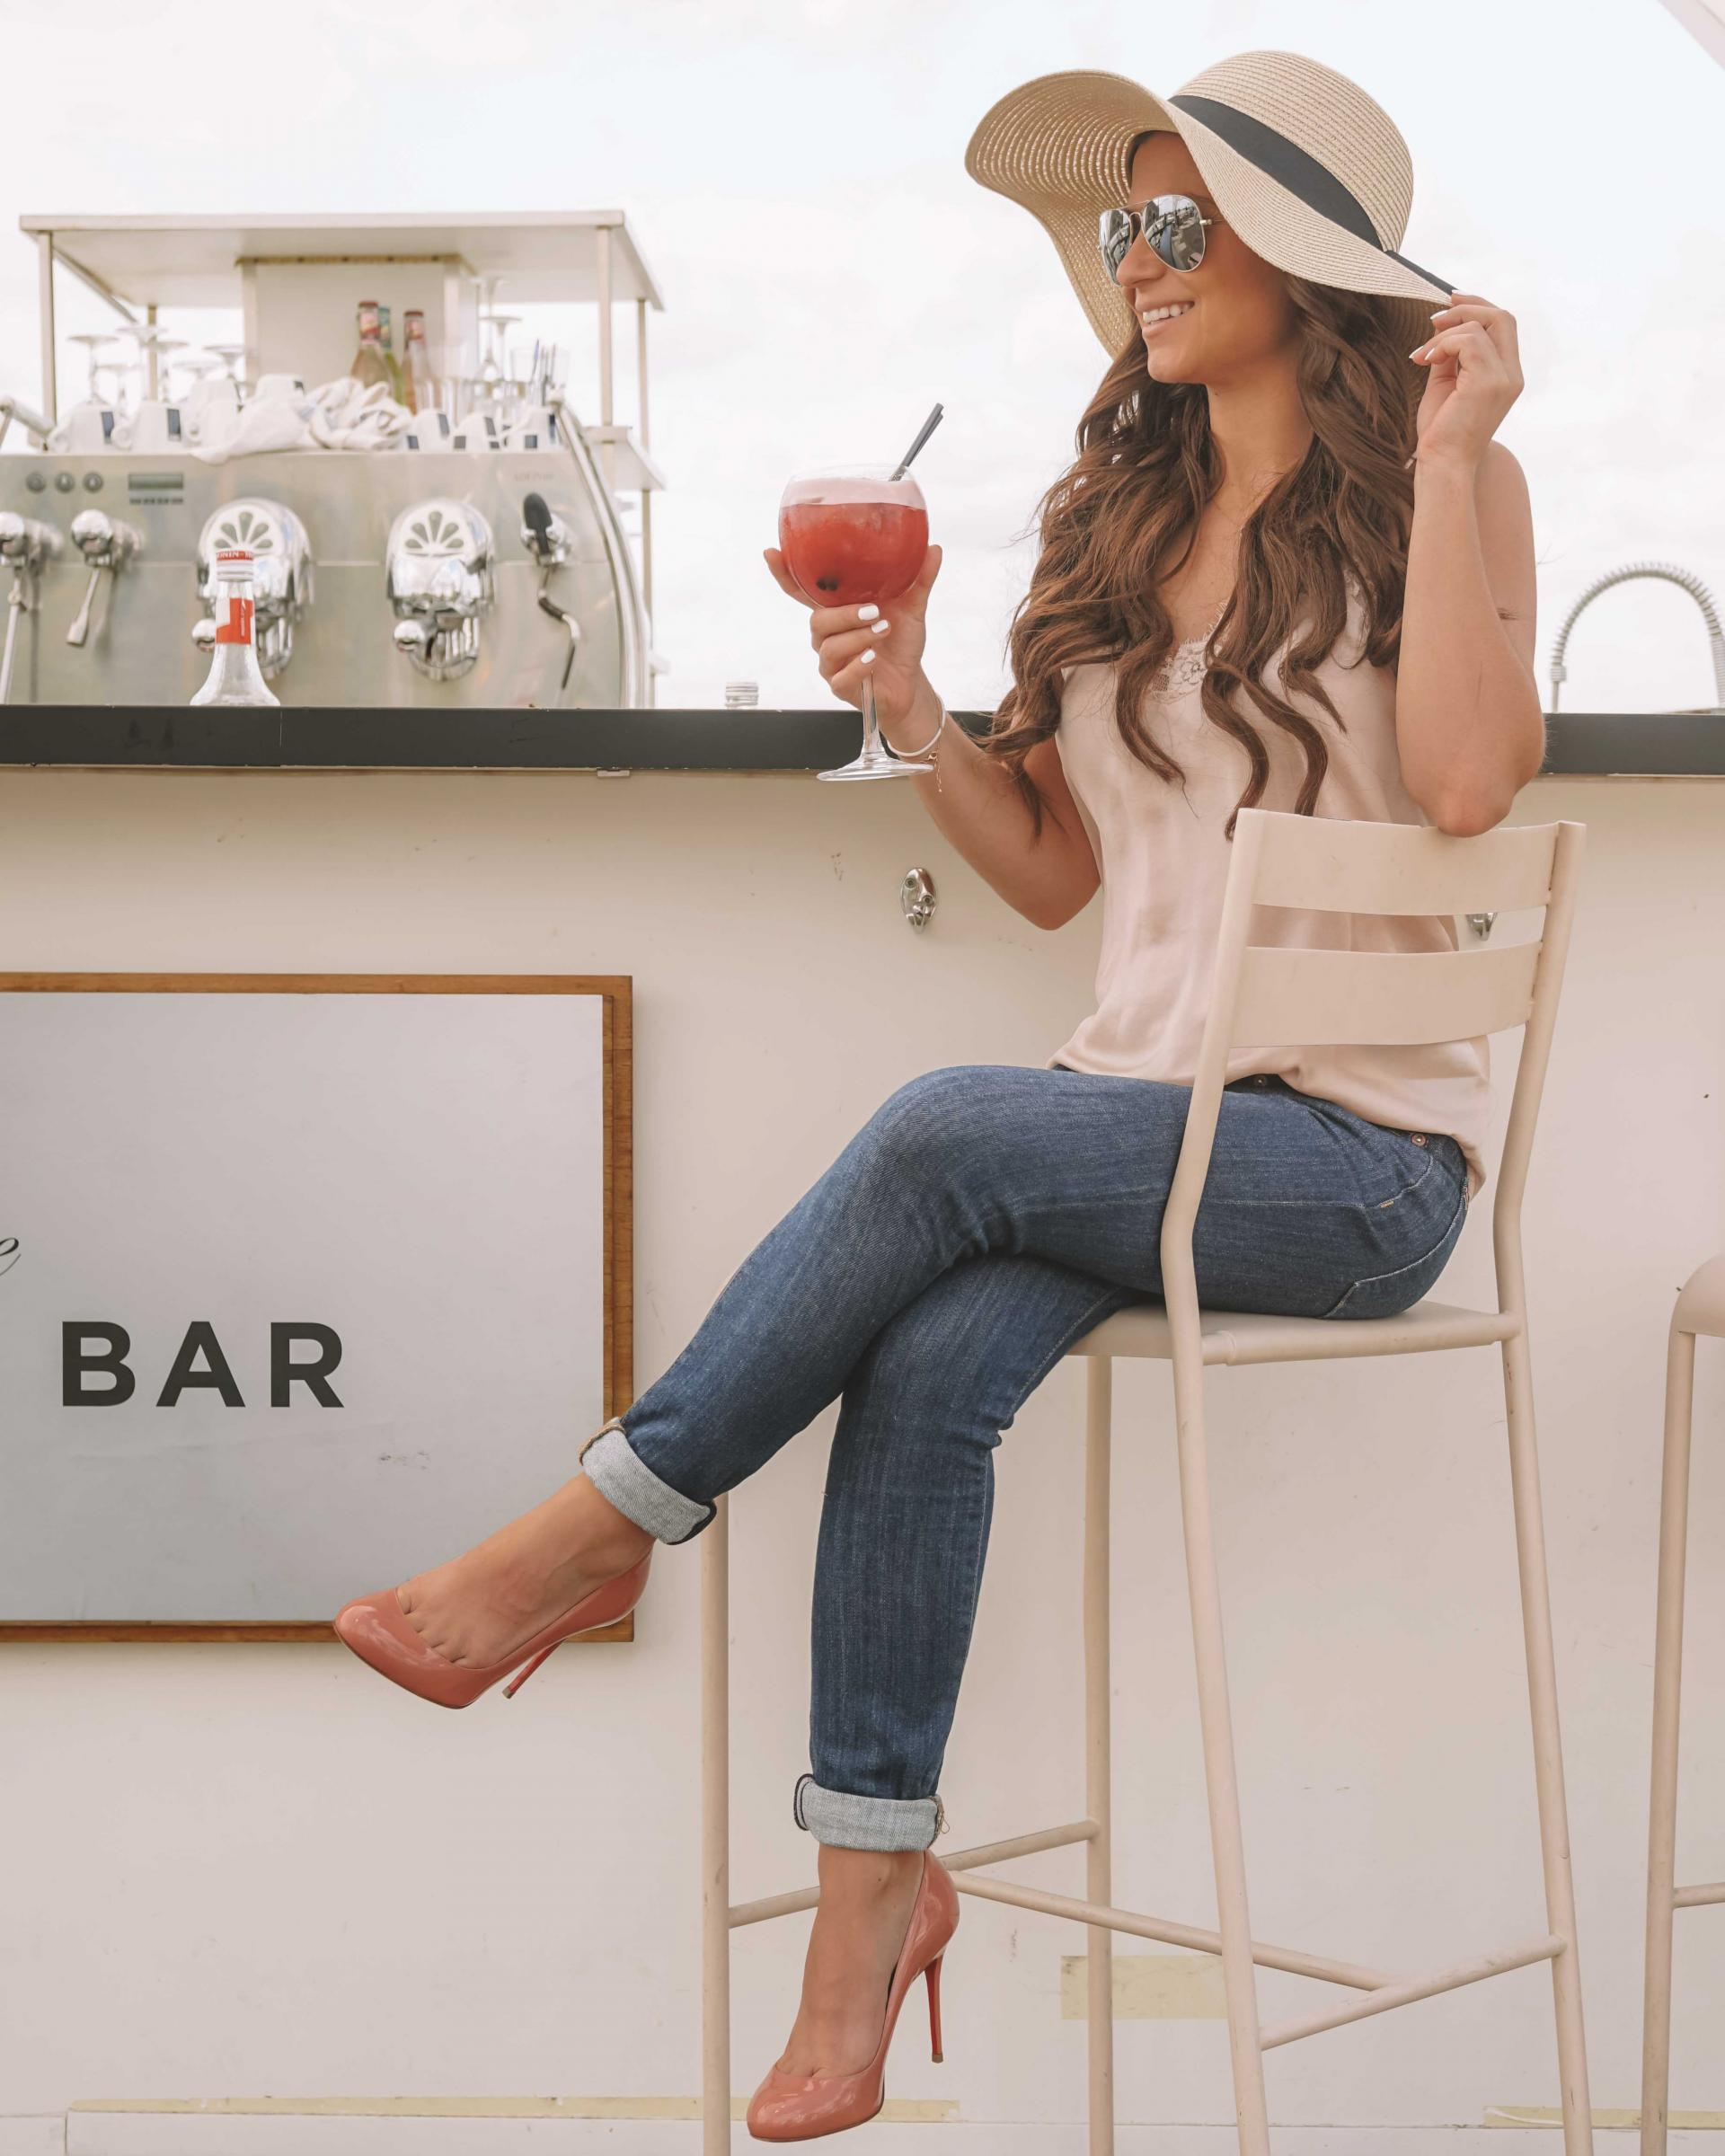 galeries lafayette bar